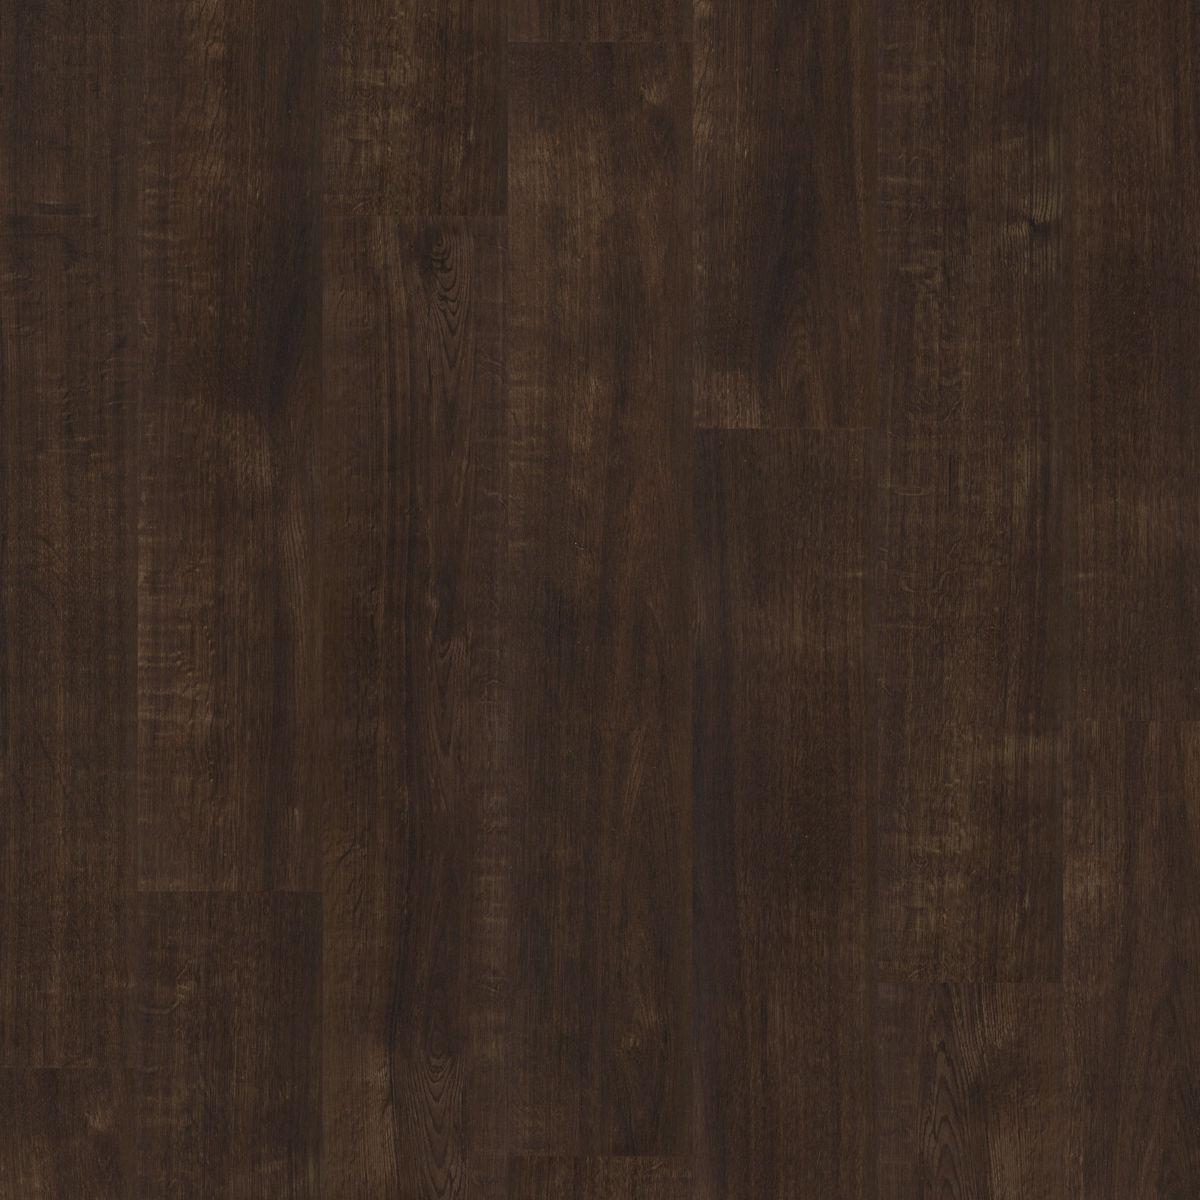 Opus atra wp317 vinyl flooring karndean opus atra wp317 vinyl flooring dailygadgetfo Image collections